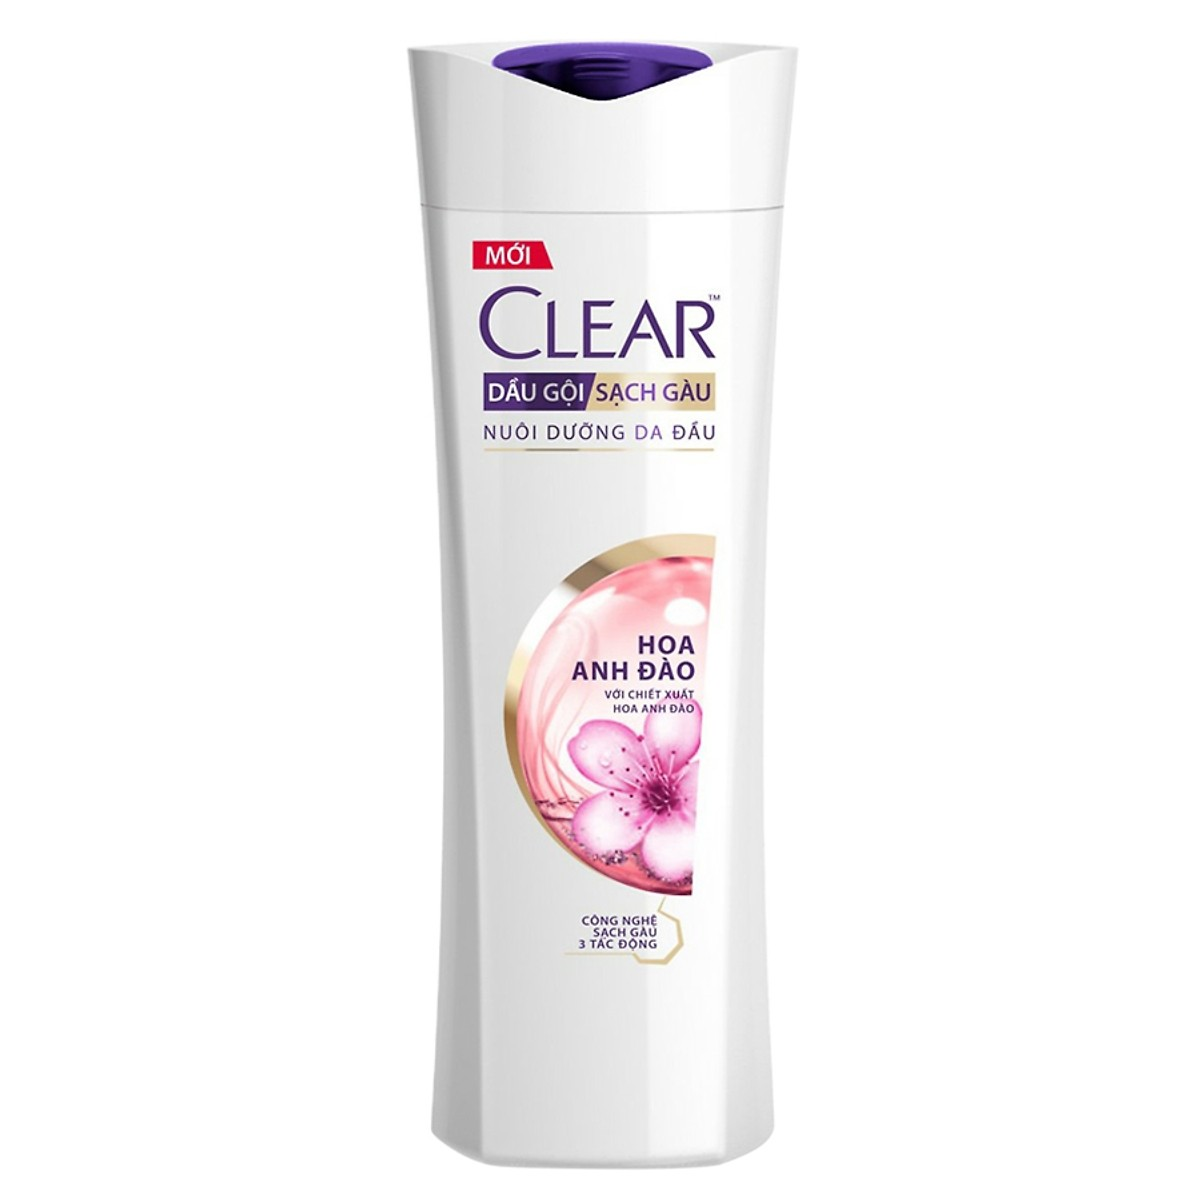 Clear fresh sakura fragrance shampoo 370g x 12 blts